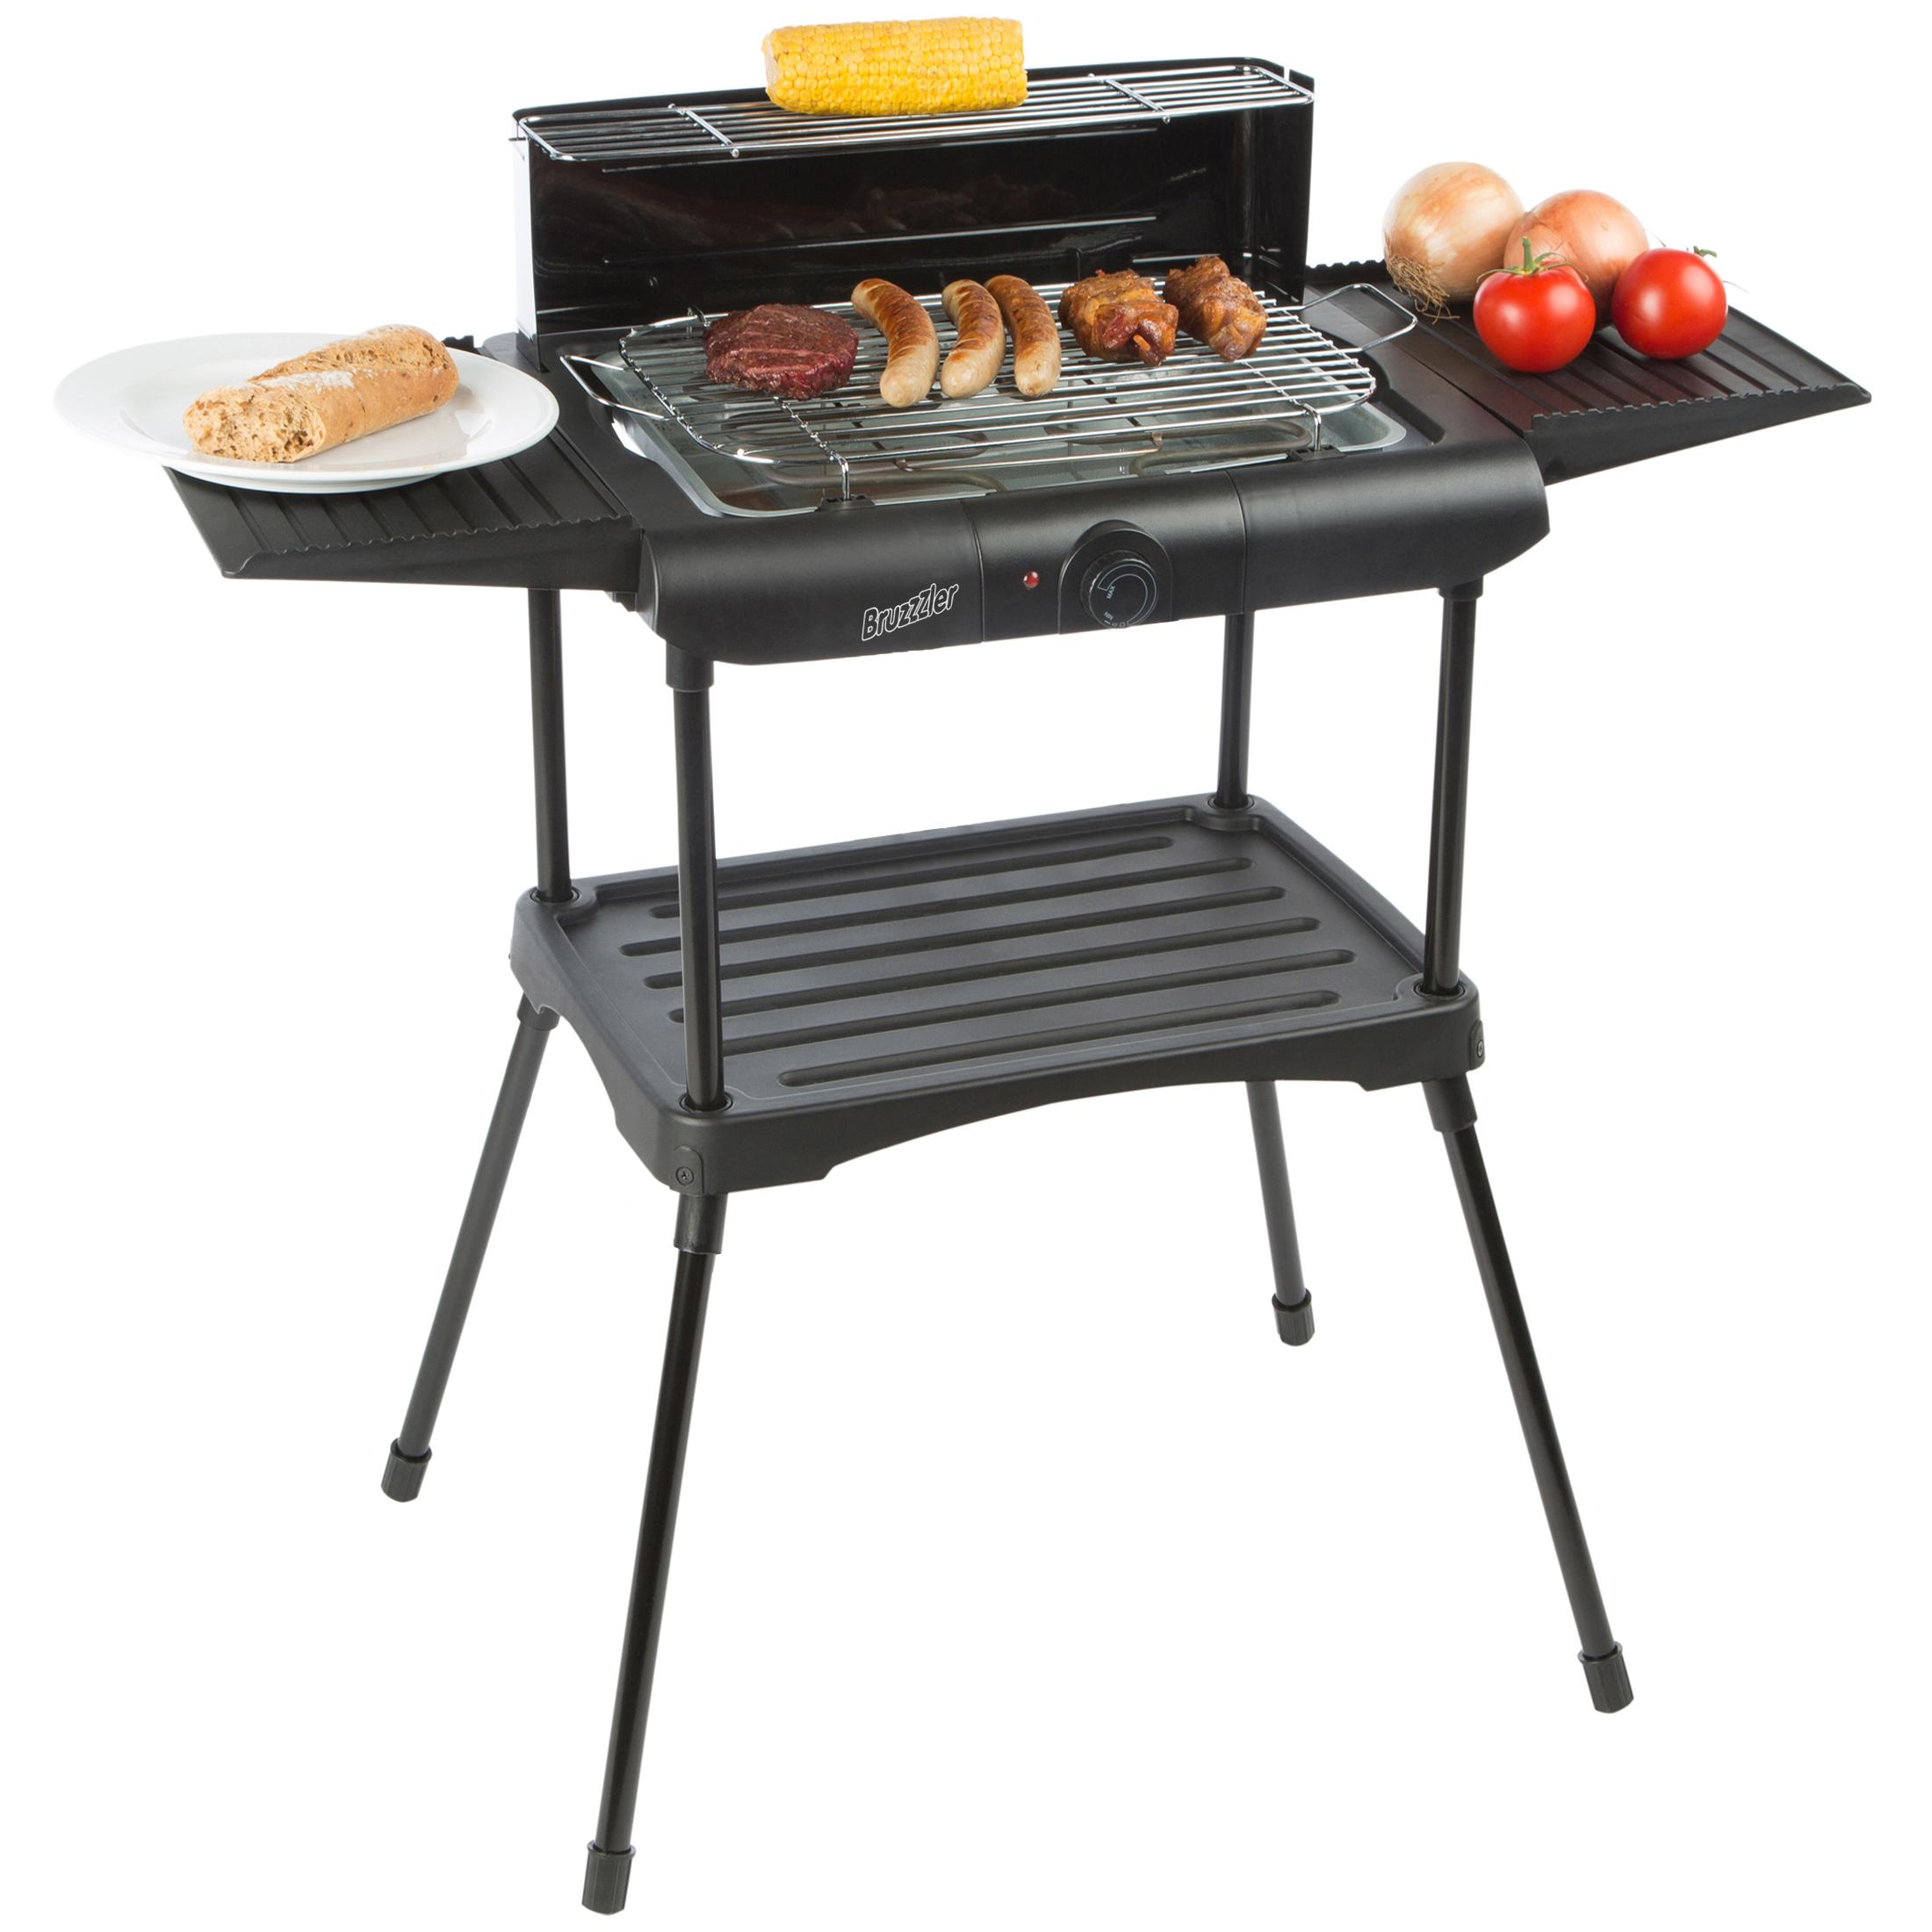 bruzzzler bbq elektrogrill f r raucharmes grillen standgrill elektrisch 2000 watt barbecue. Black Bedroom Furniture Sets. Home Design Ideas